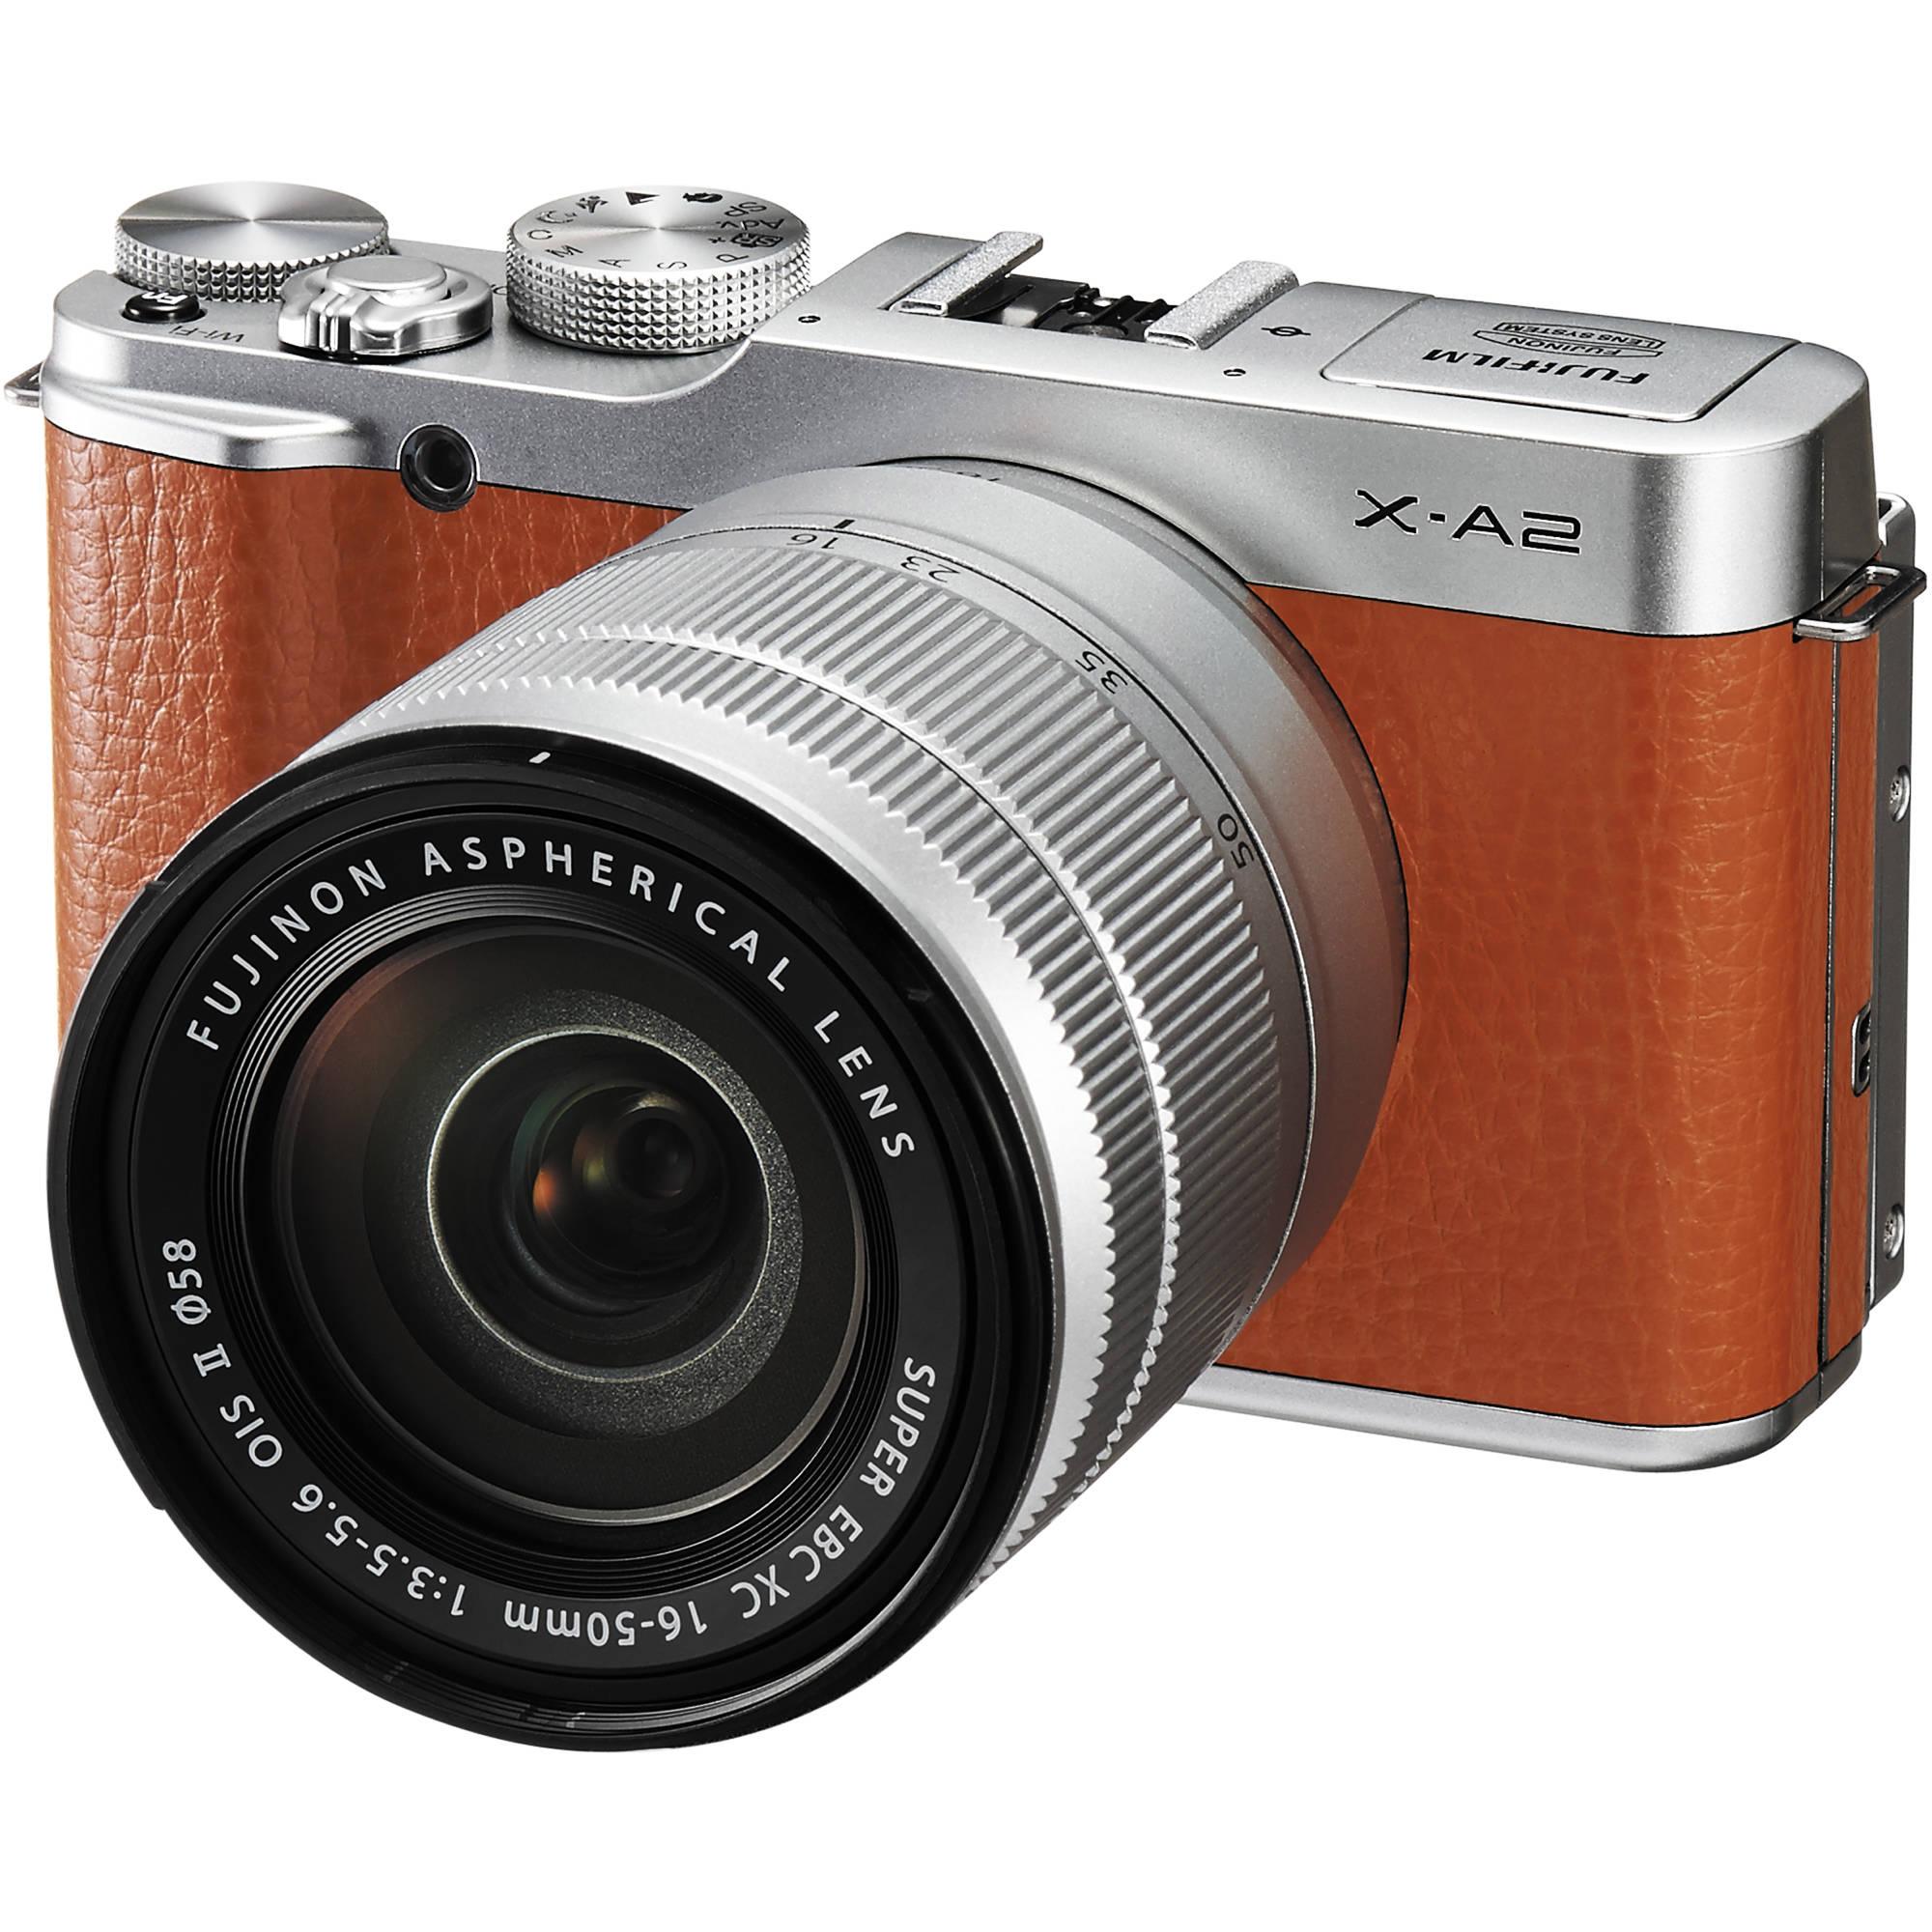 Fuji Digital Cameras: FUJIFILM X-A2 Mirrorless Digital Camera With 16-50mm 16455130